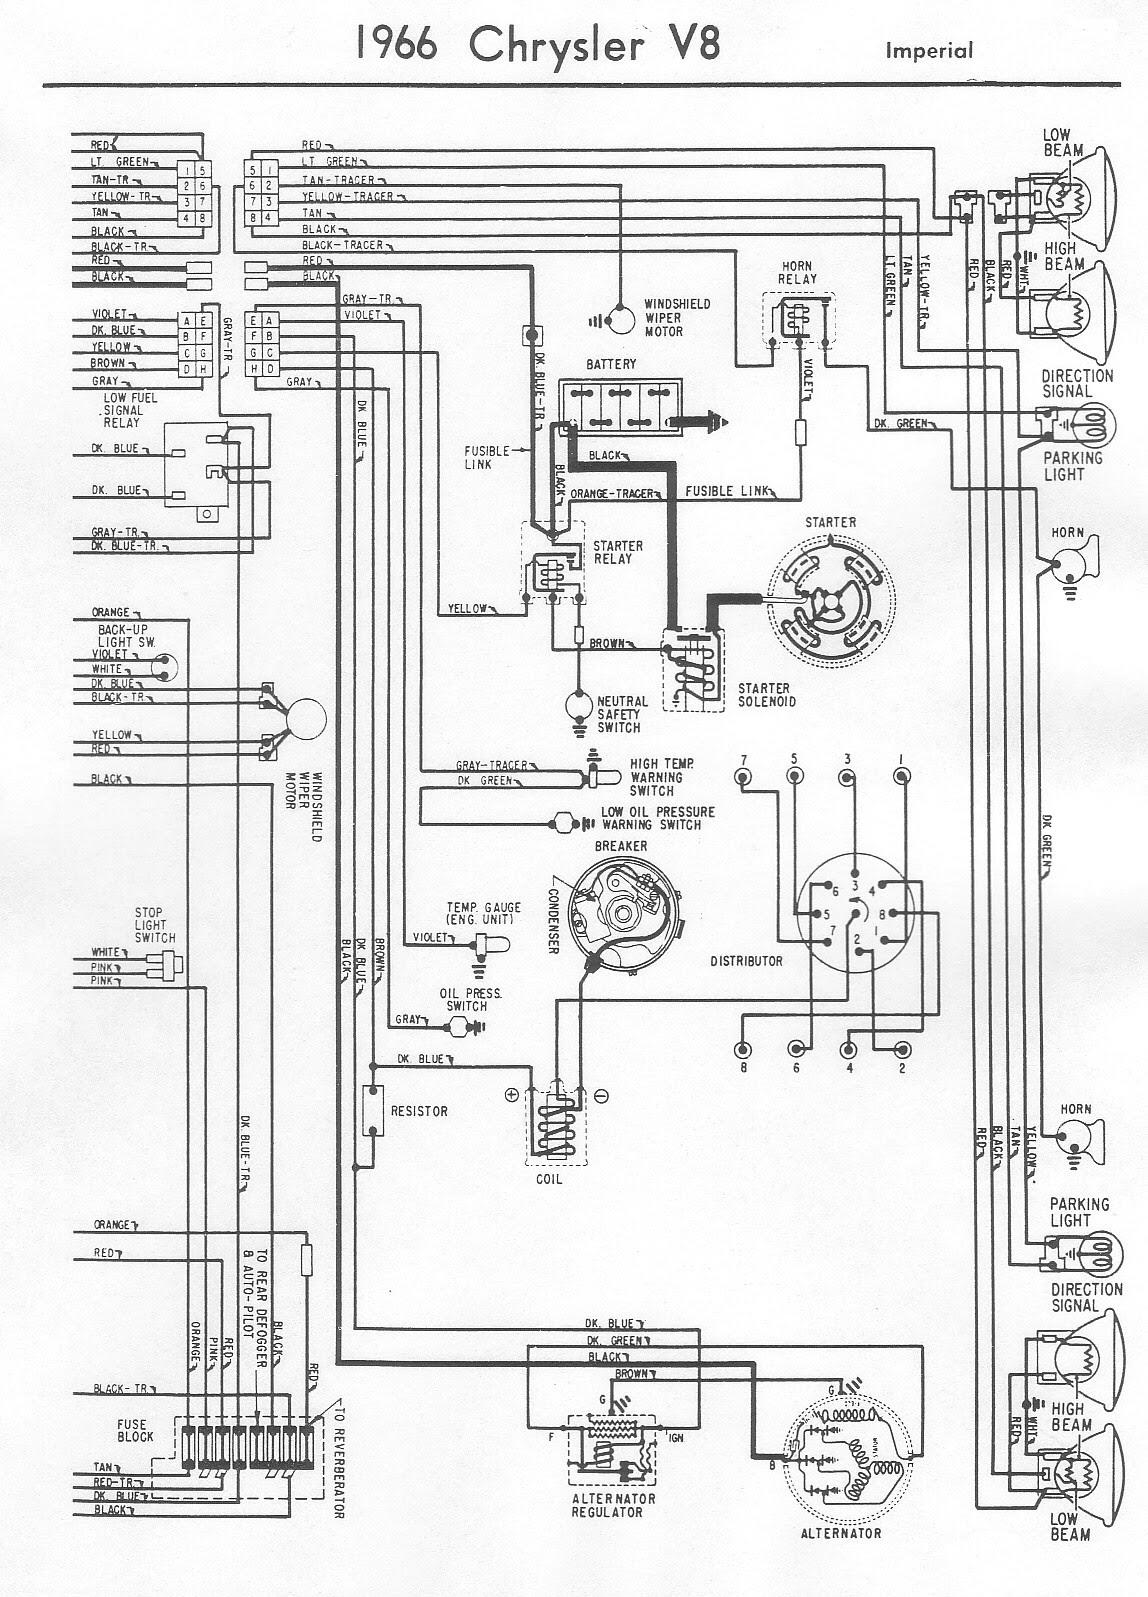 1966 Chrysler 300 Electric Window Wiring Diagram Wiring Diagrams Facility Facility Chatteriedelavalleedufelin Fr